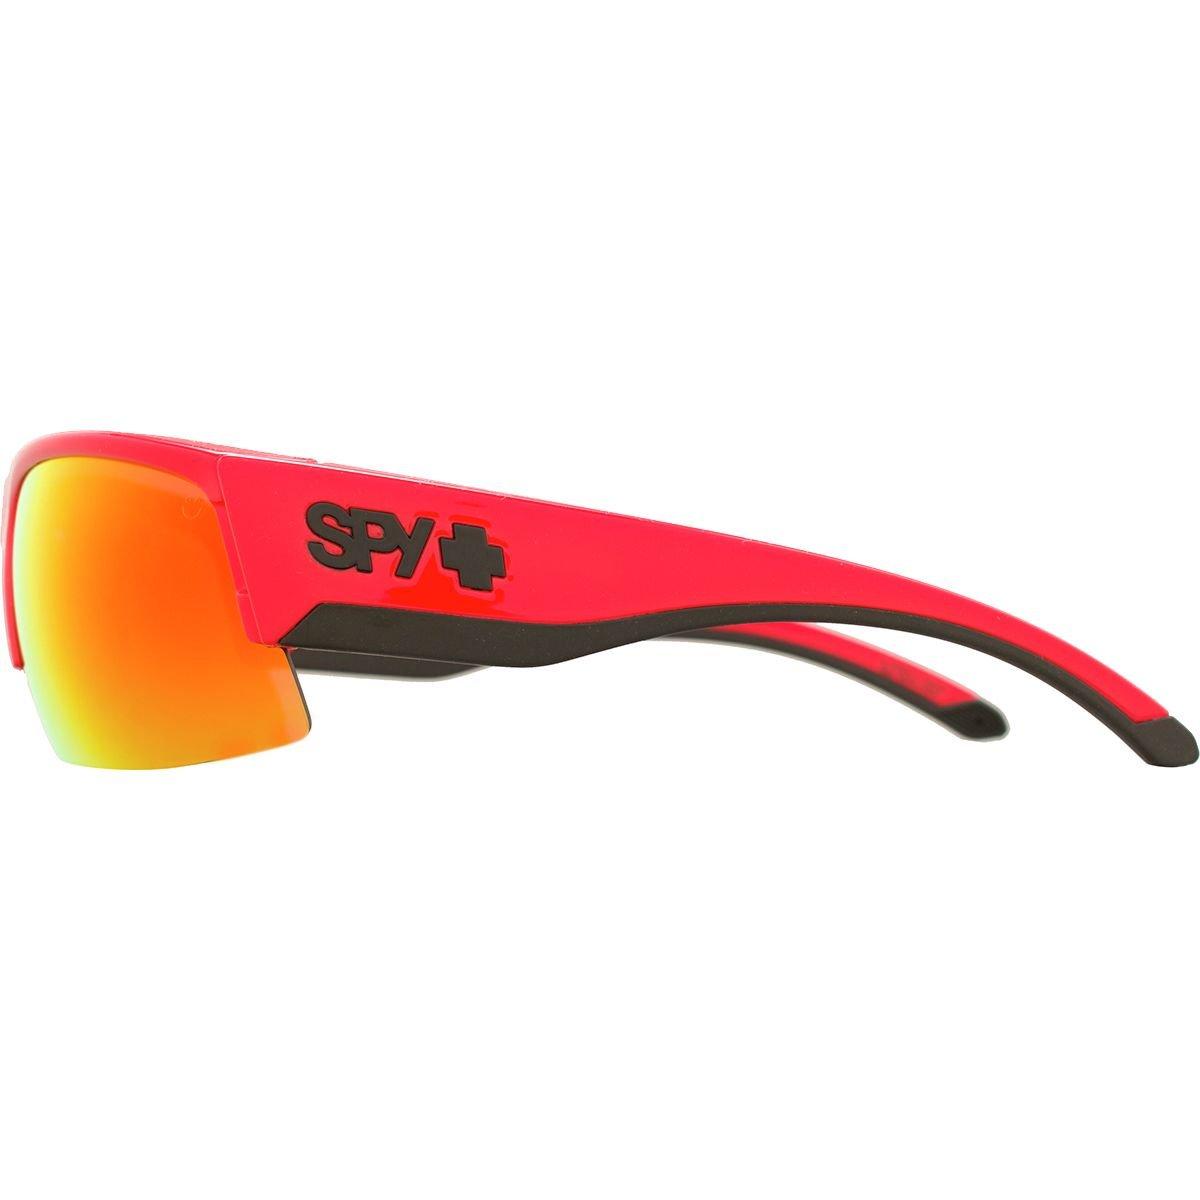 7edc6eef5b3ae SPY Optic Flyer 透明性能太阳镜